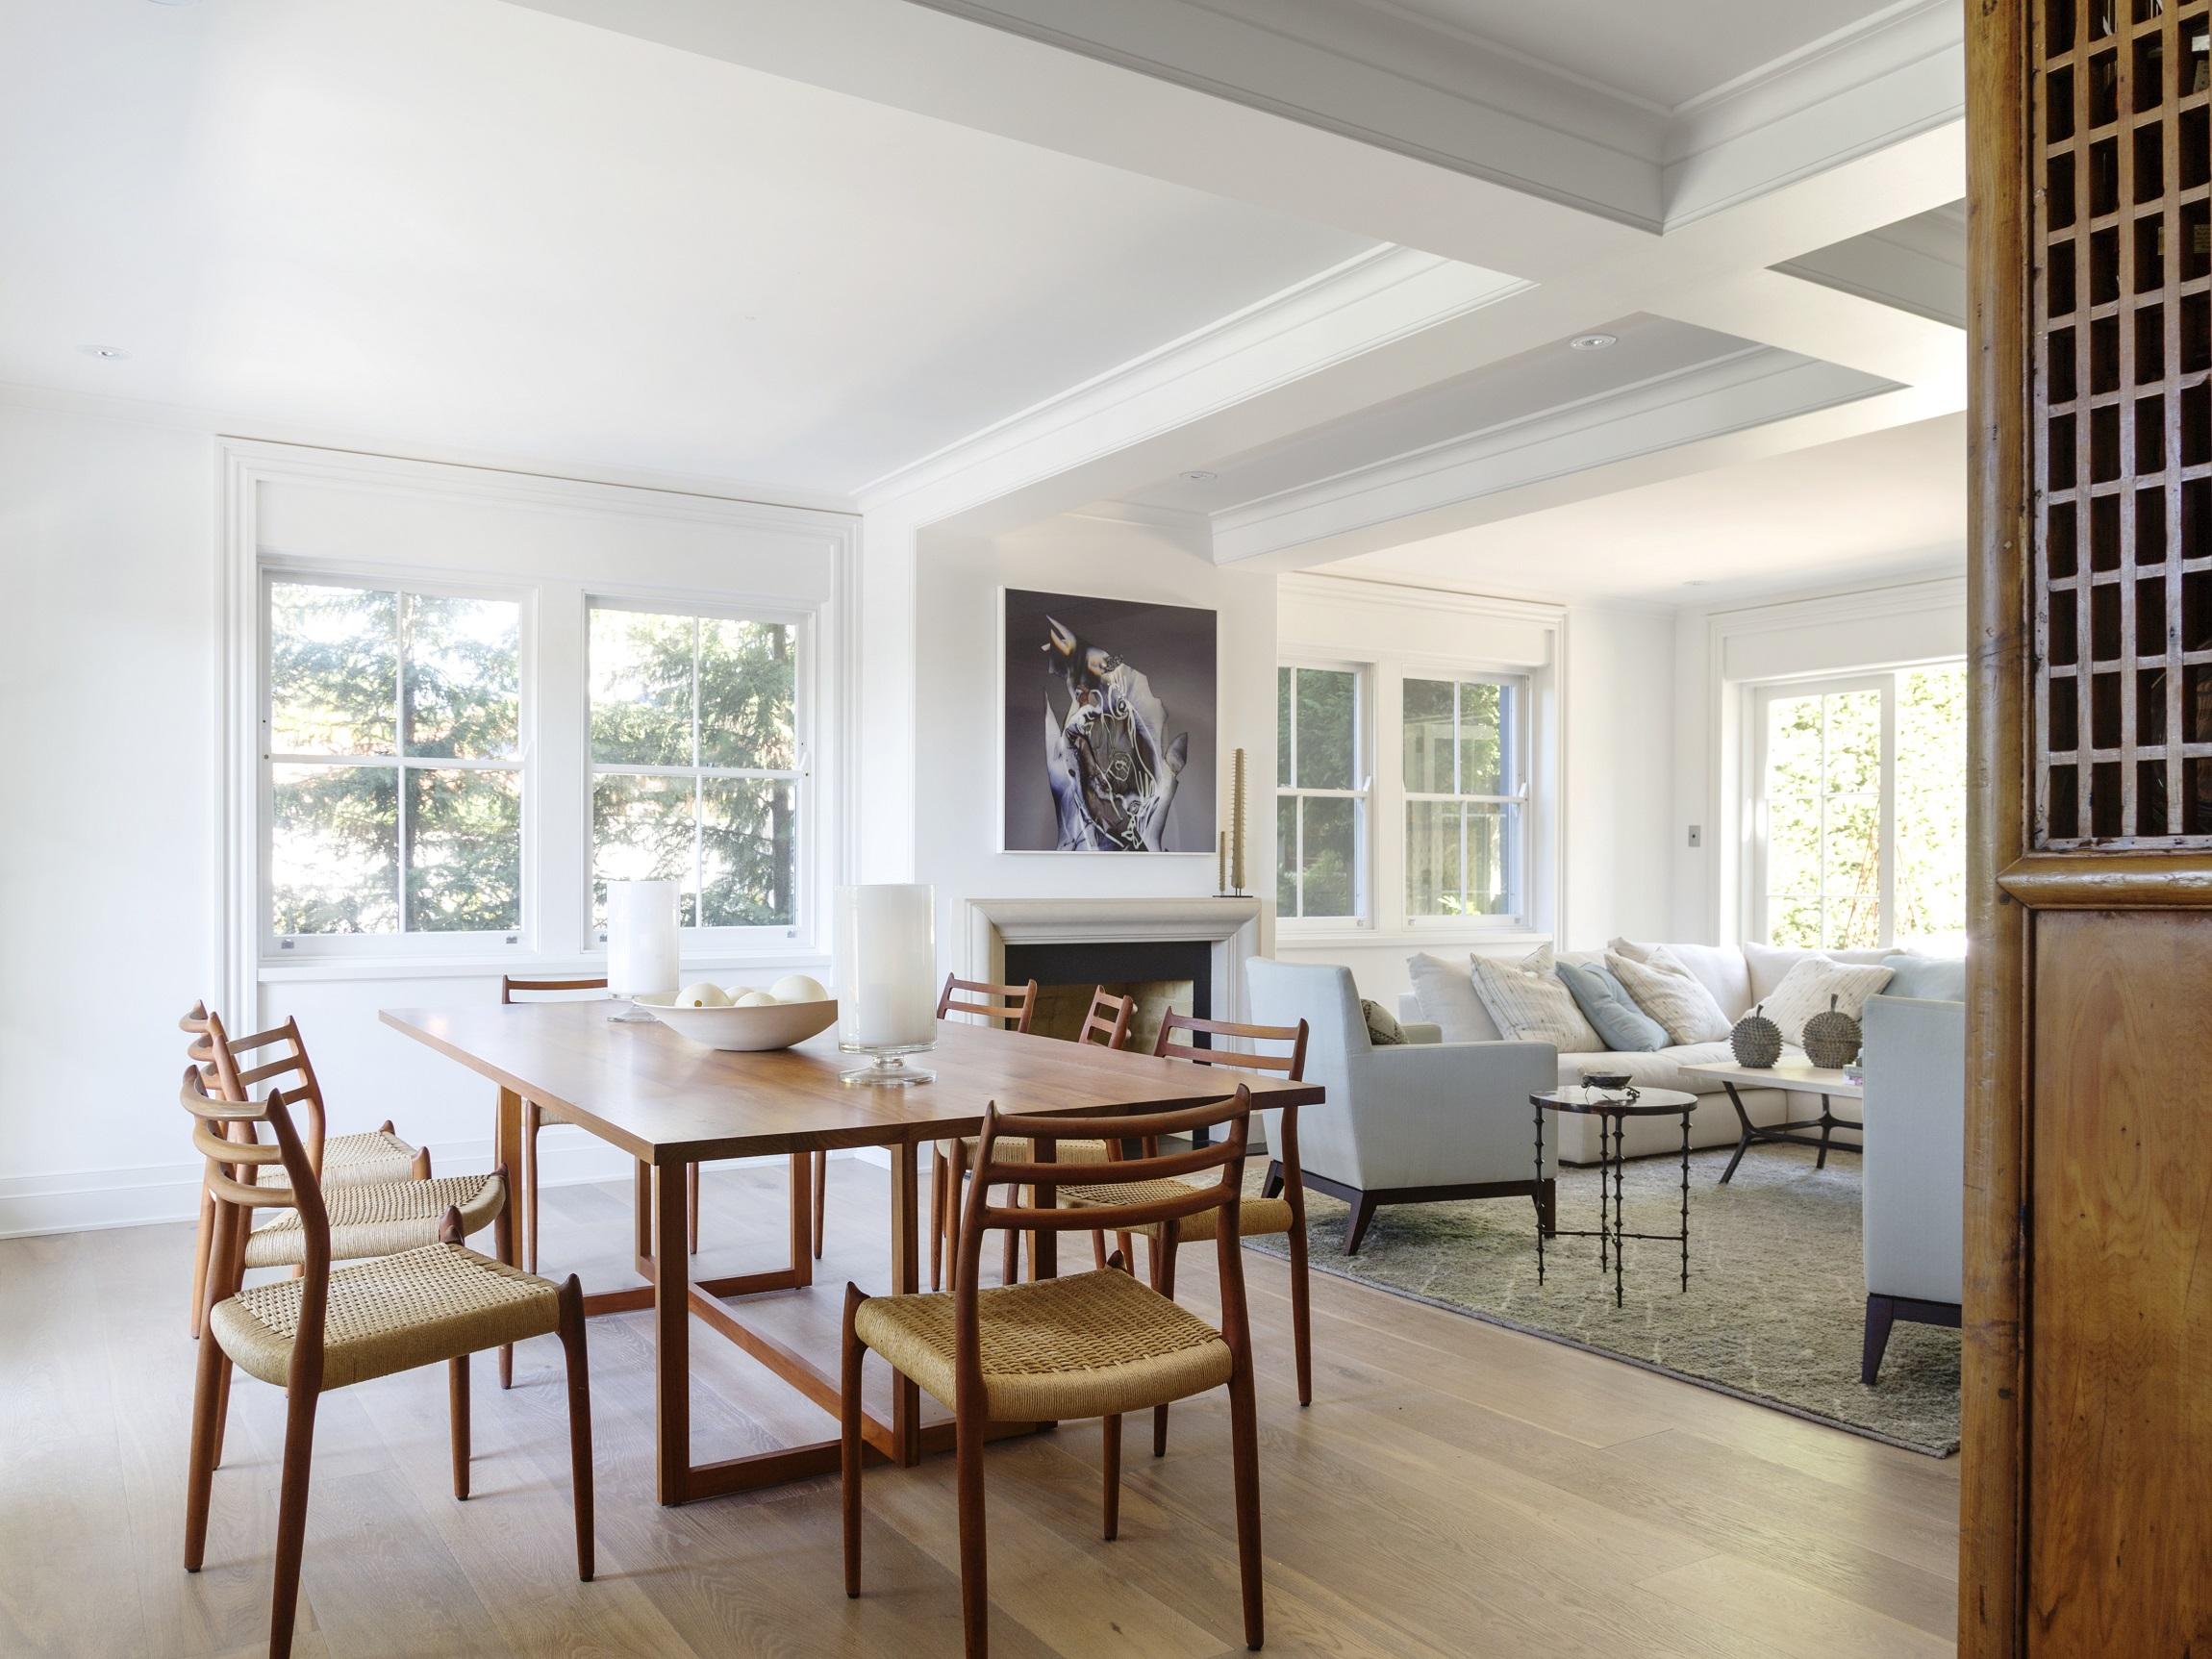 Art-Deco-Interior-Design-Dining-Room-Bellevue-Hill-Michael-Bell-Architects(2)